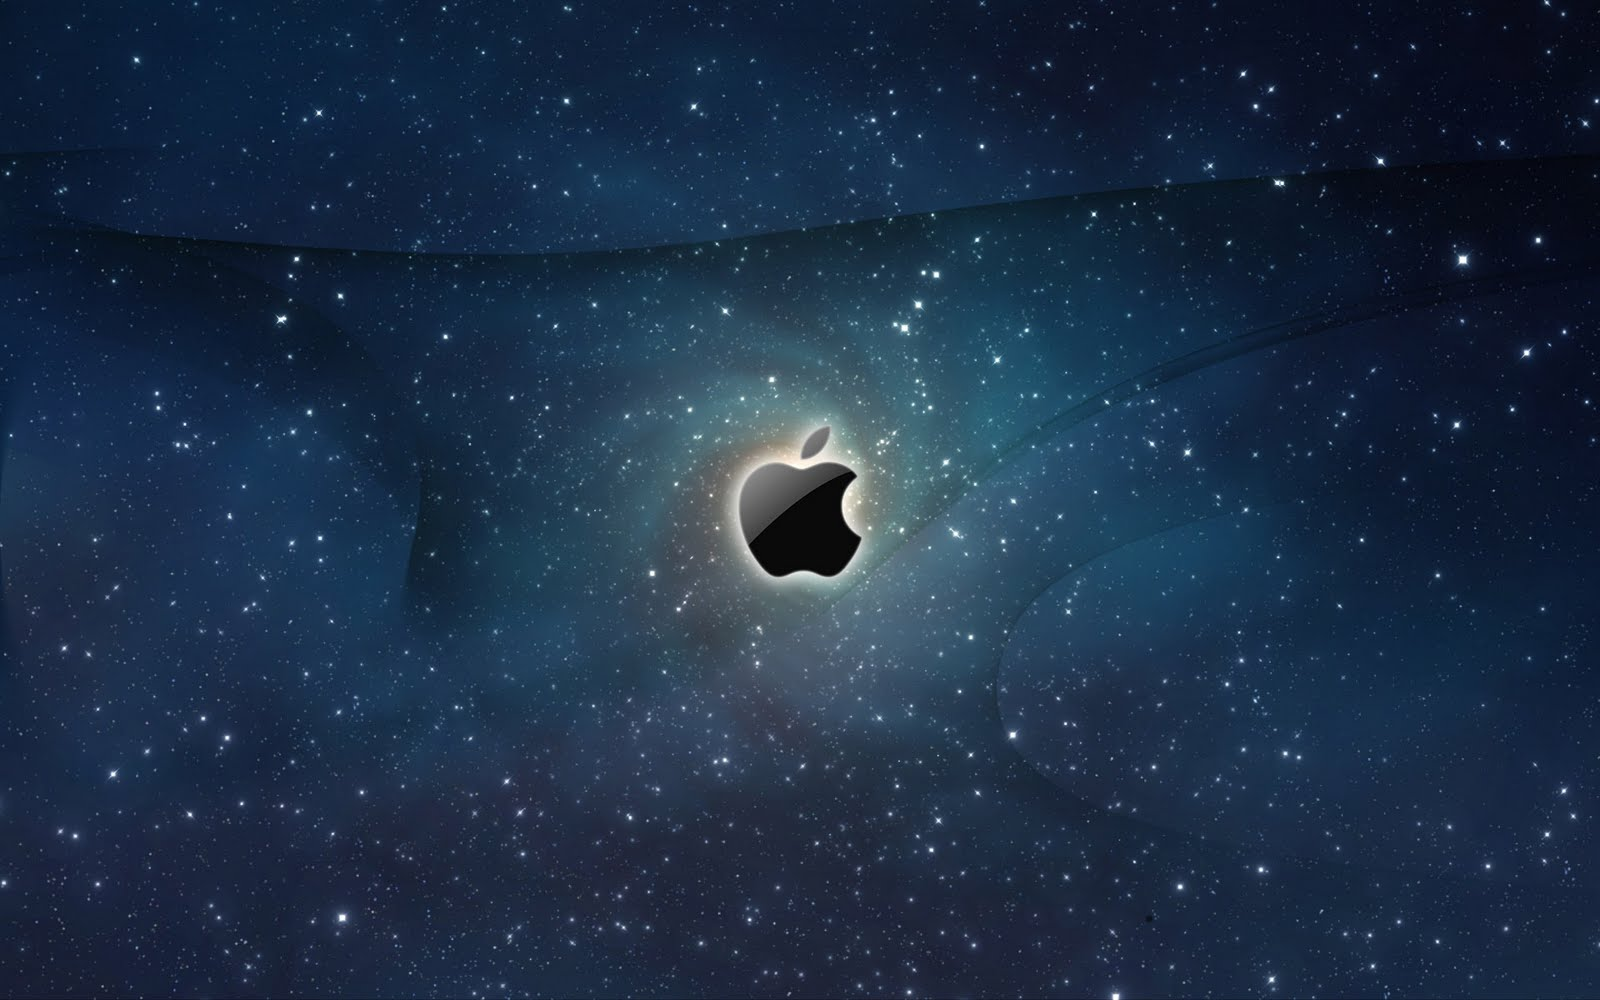 Iphone X Apple Video